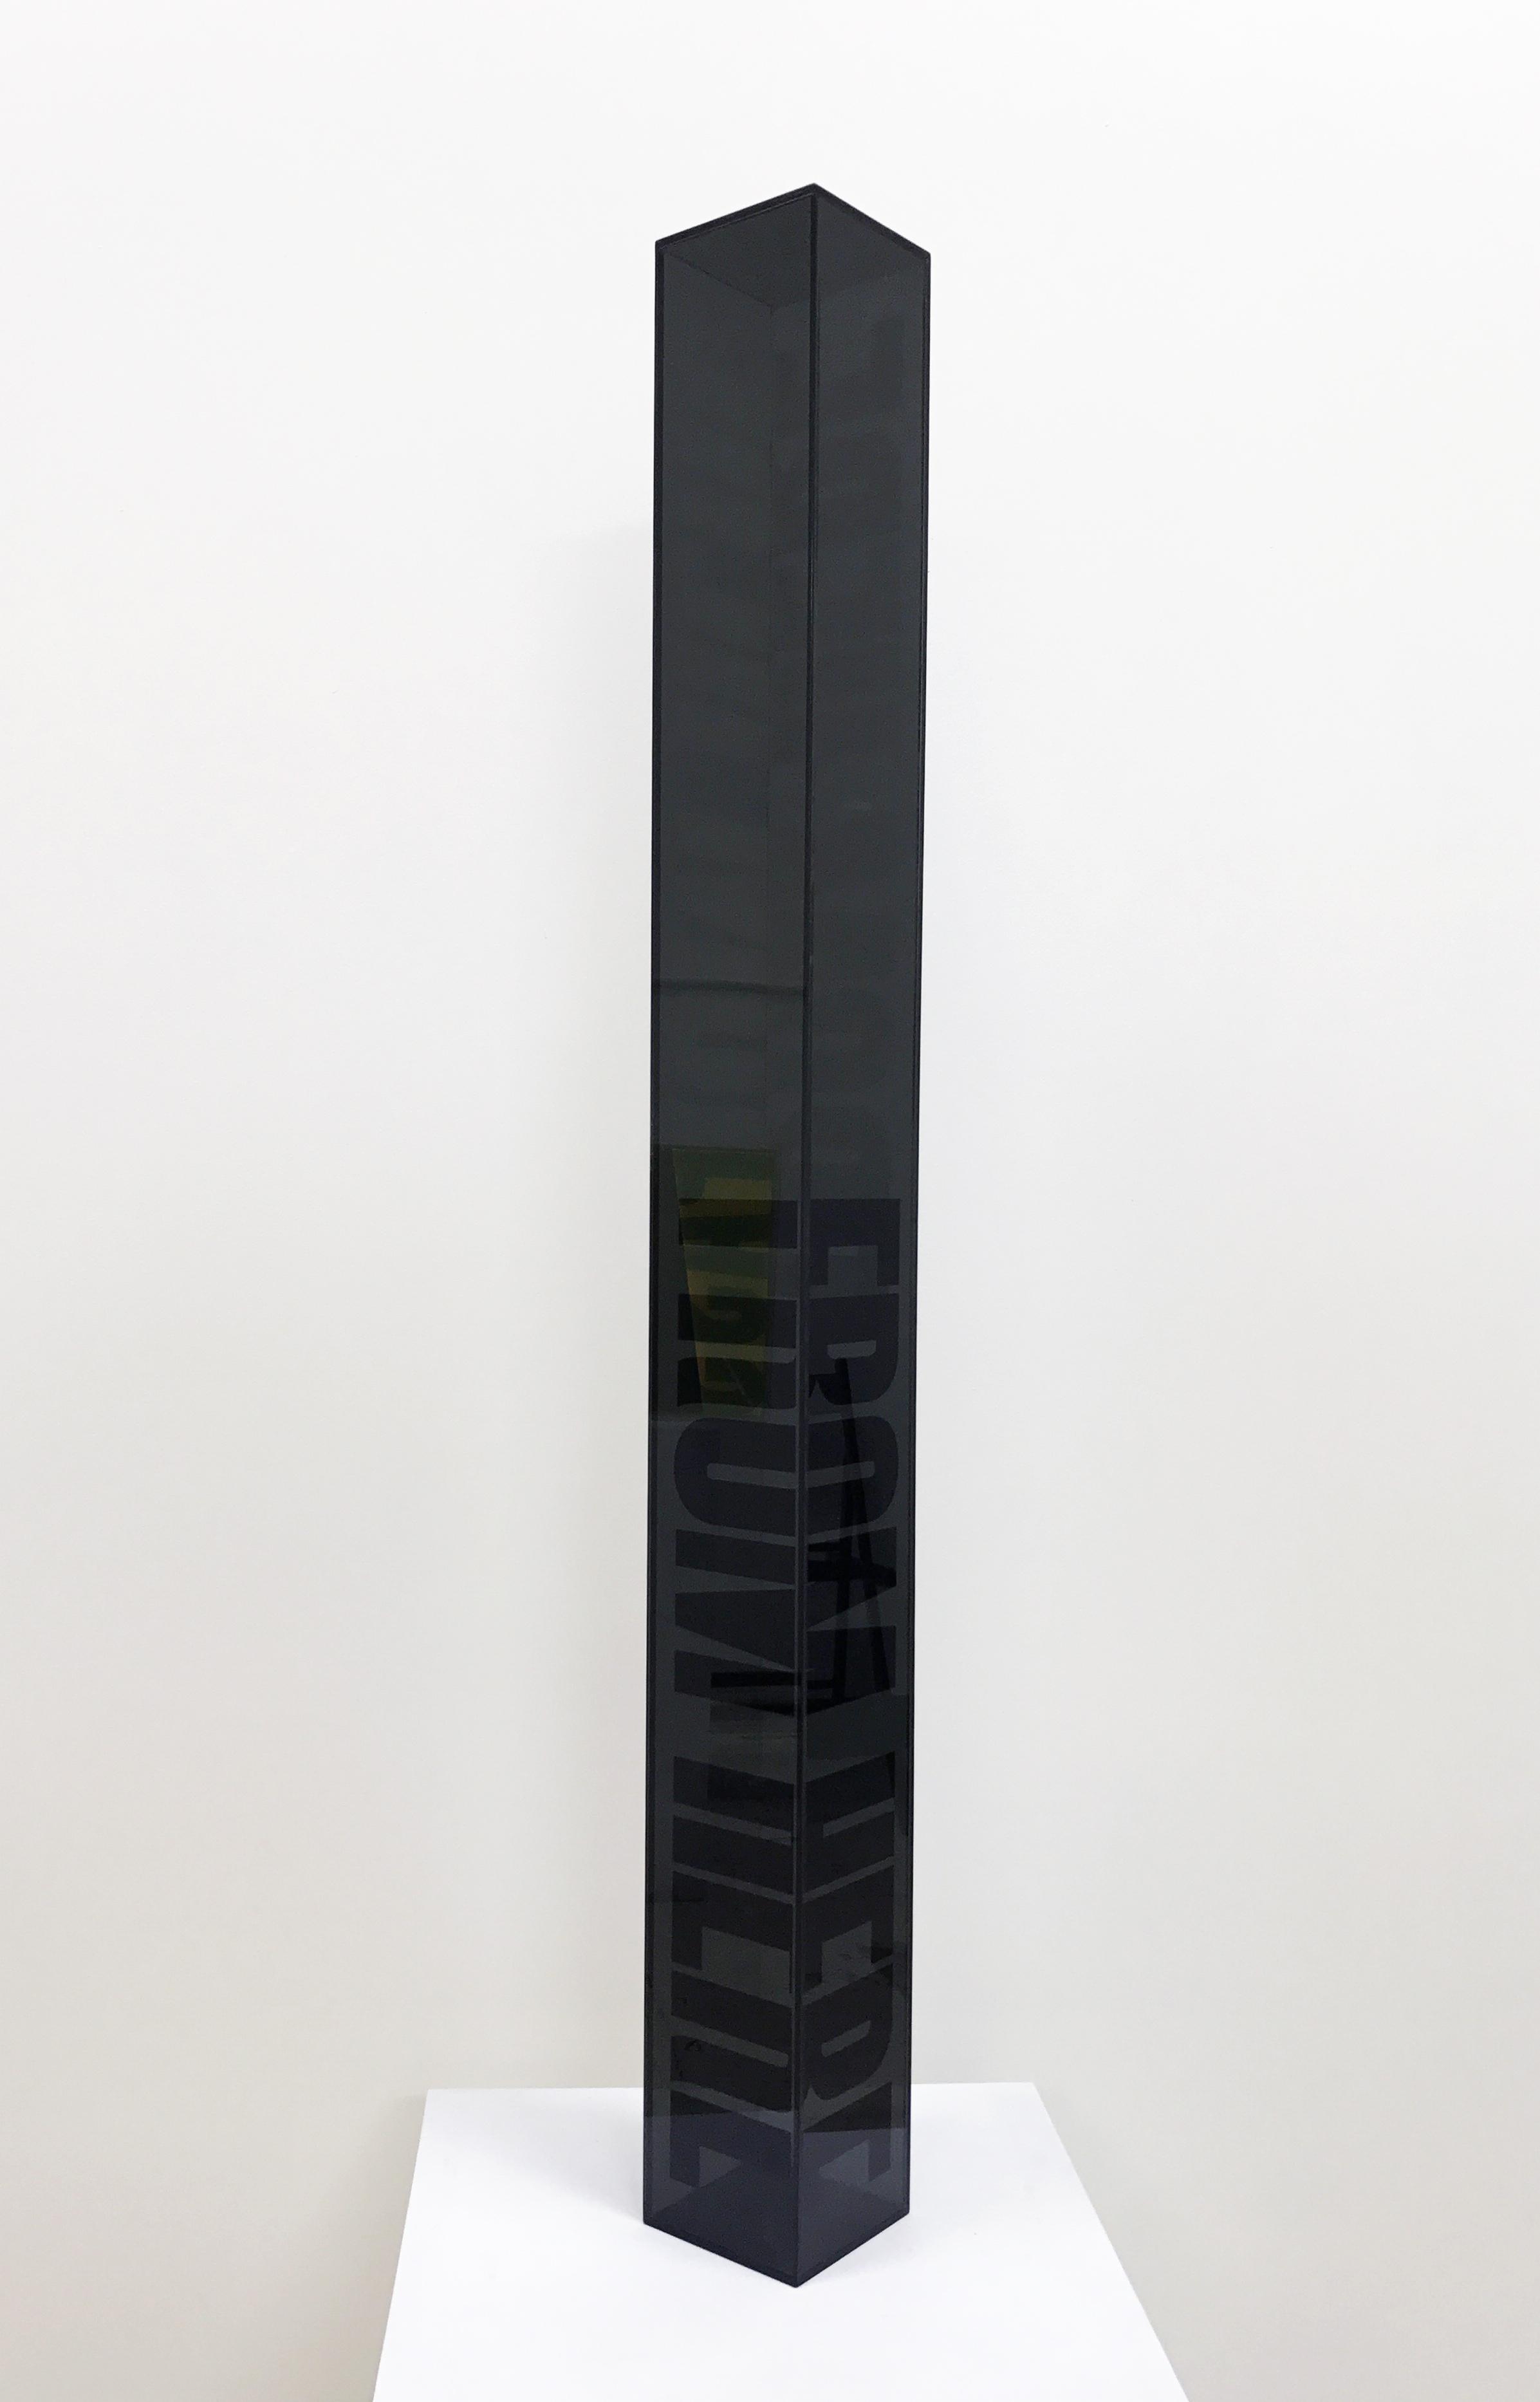 Semantics detail - acrylic sculptures, cubic sculptures